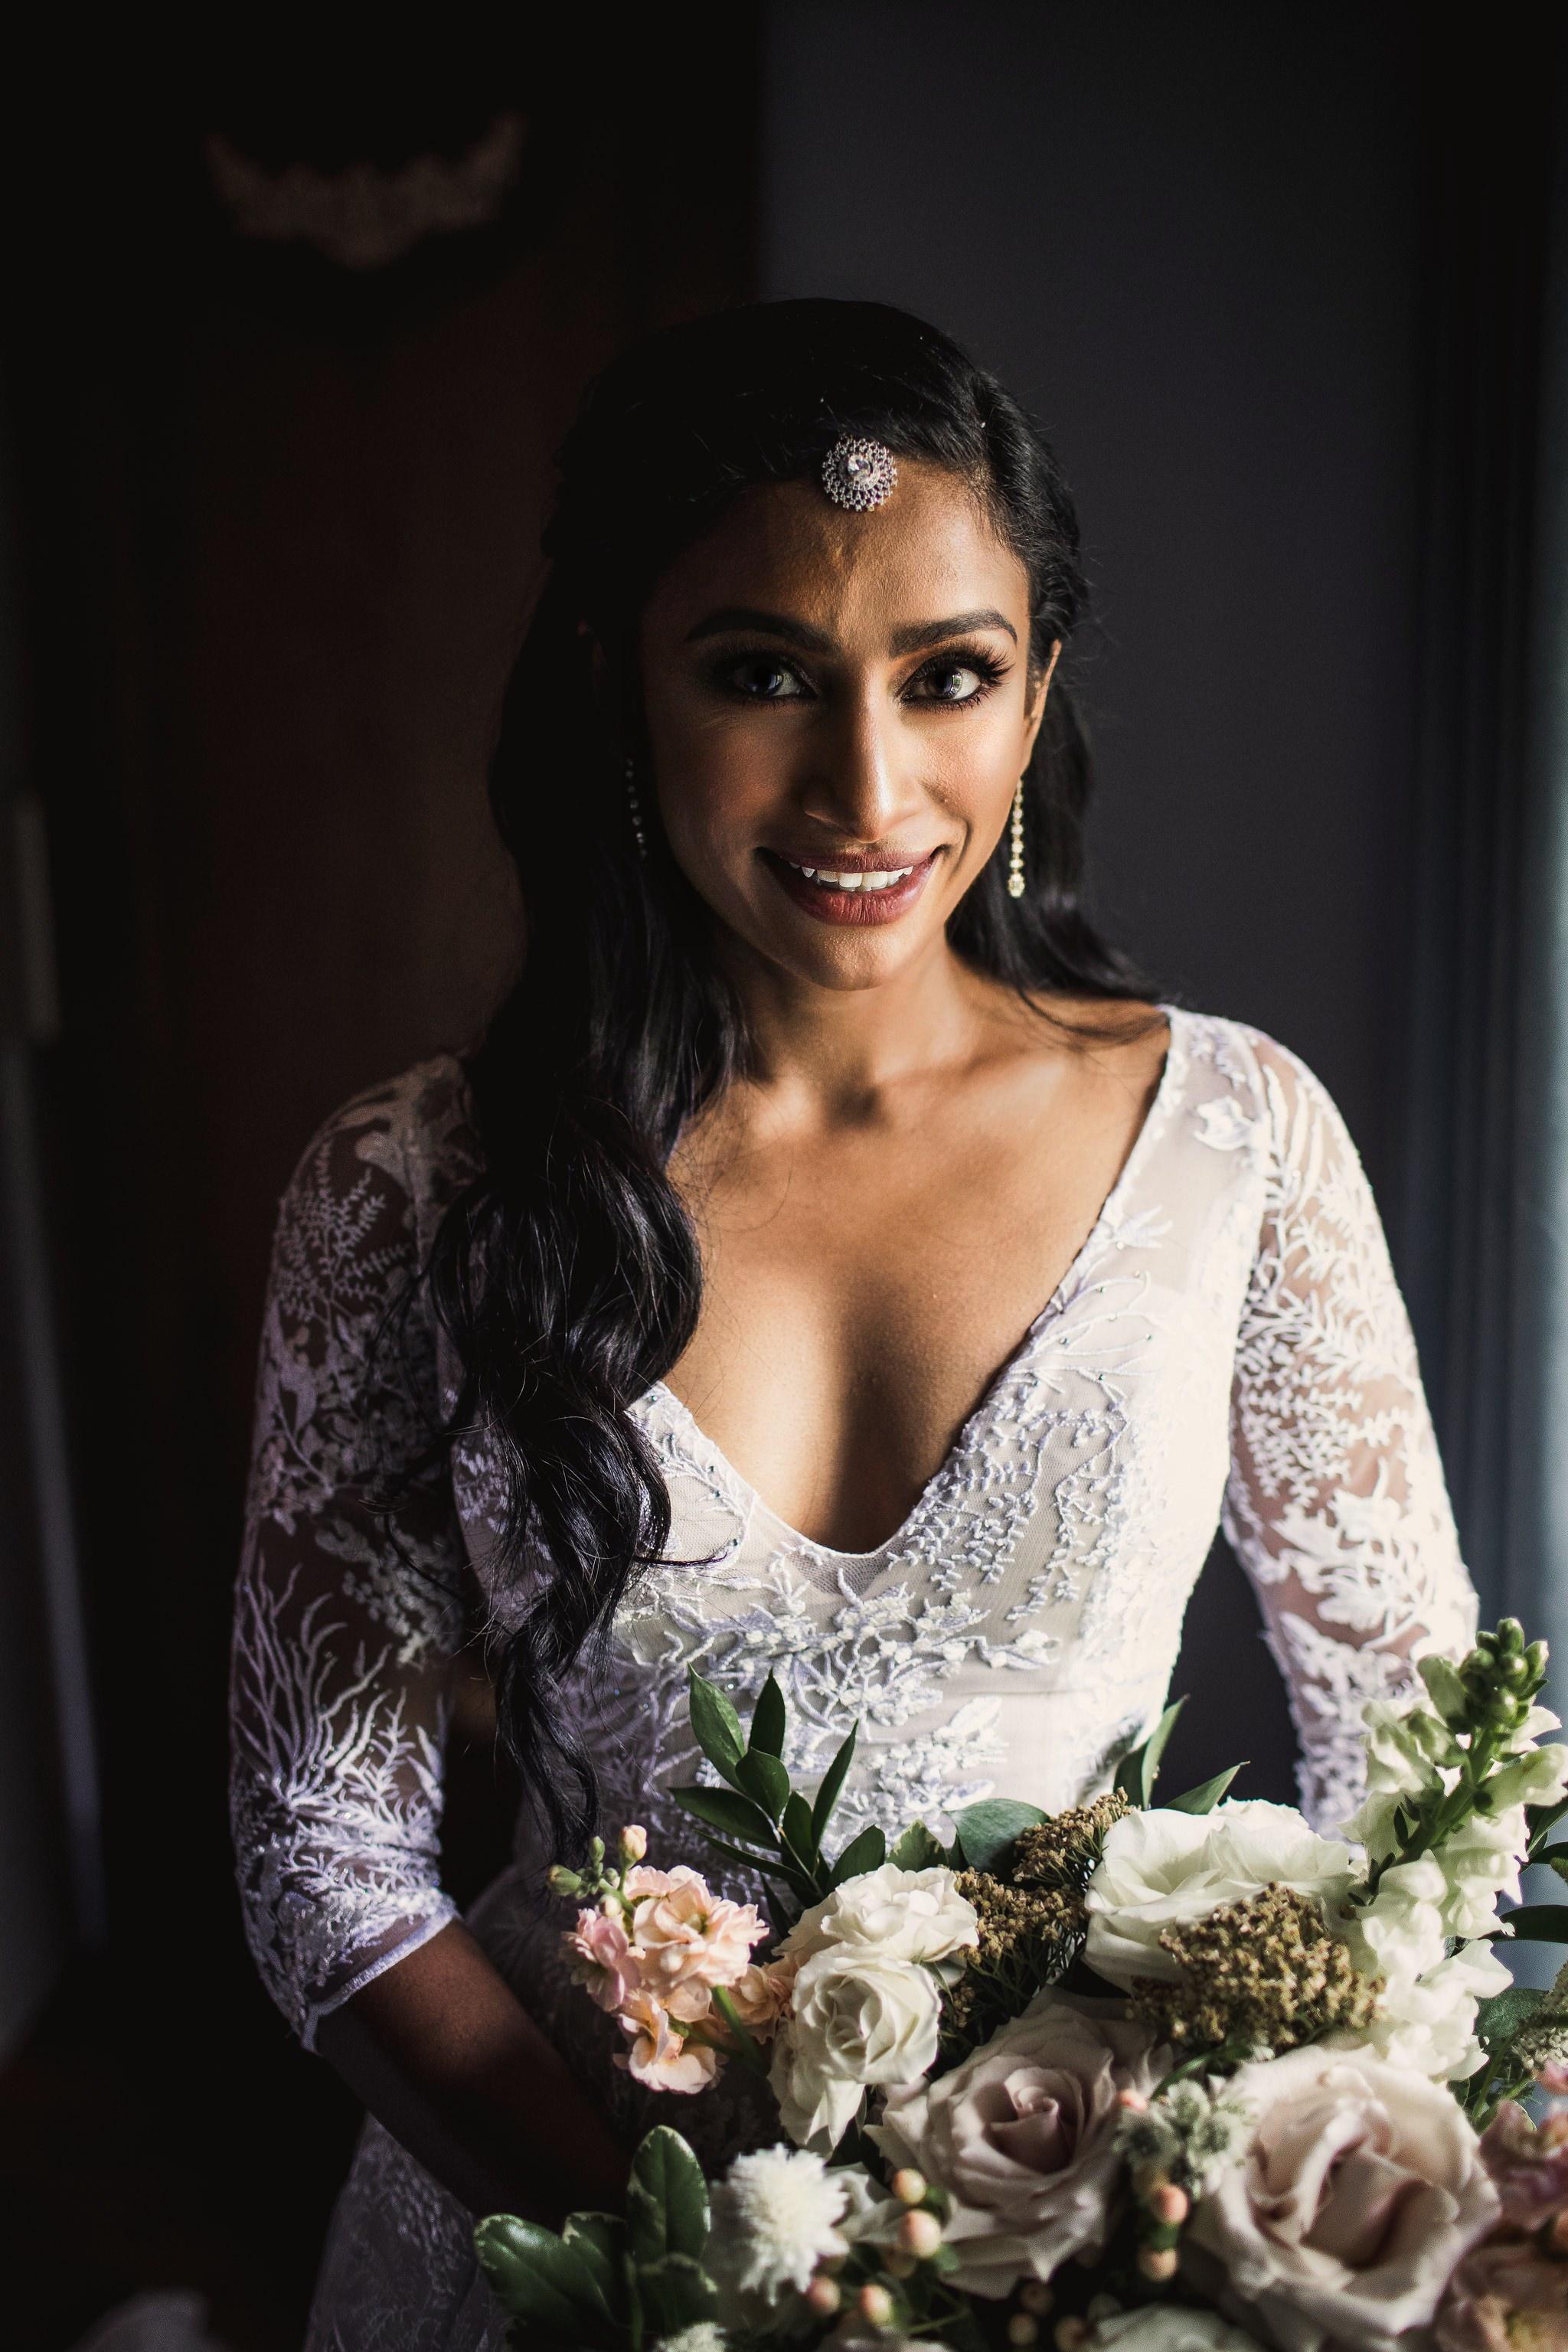 eloramillwedding 112 pp - Elora Mill Wedding